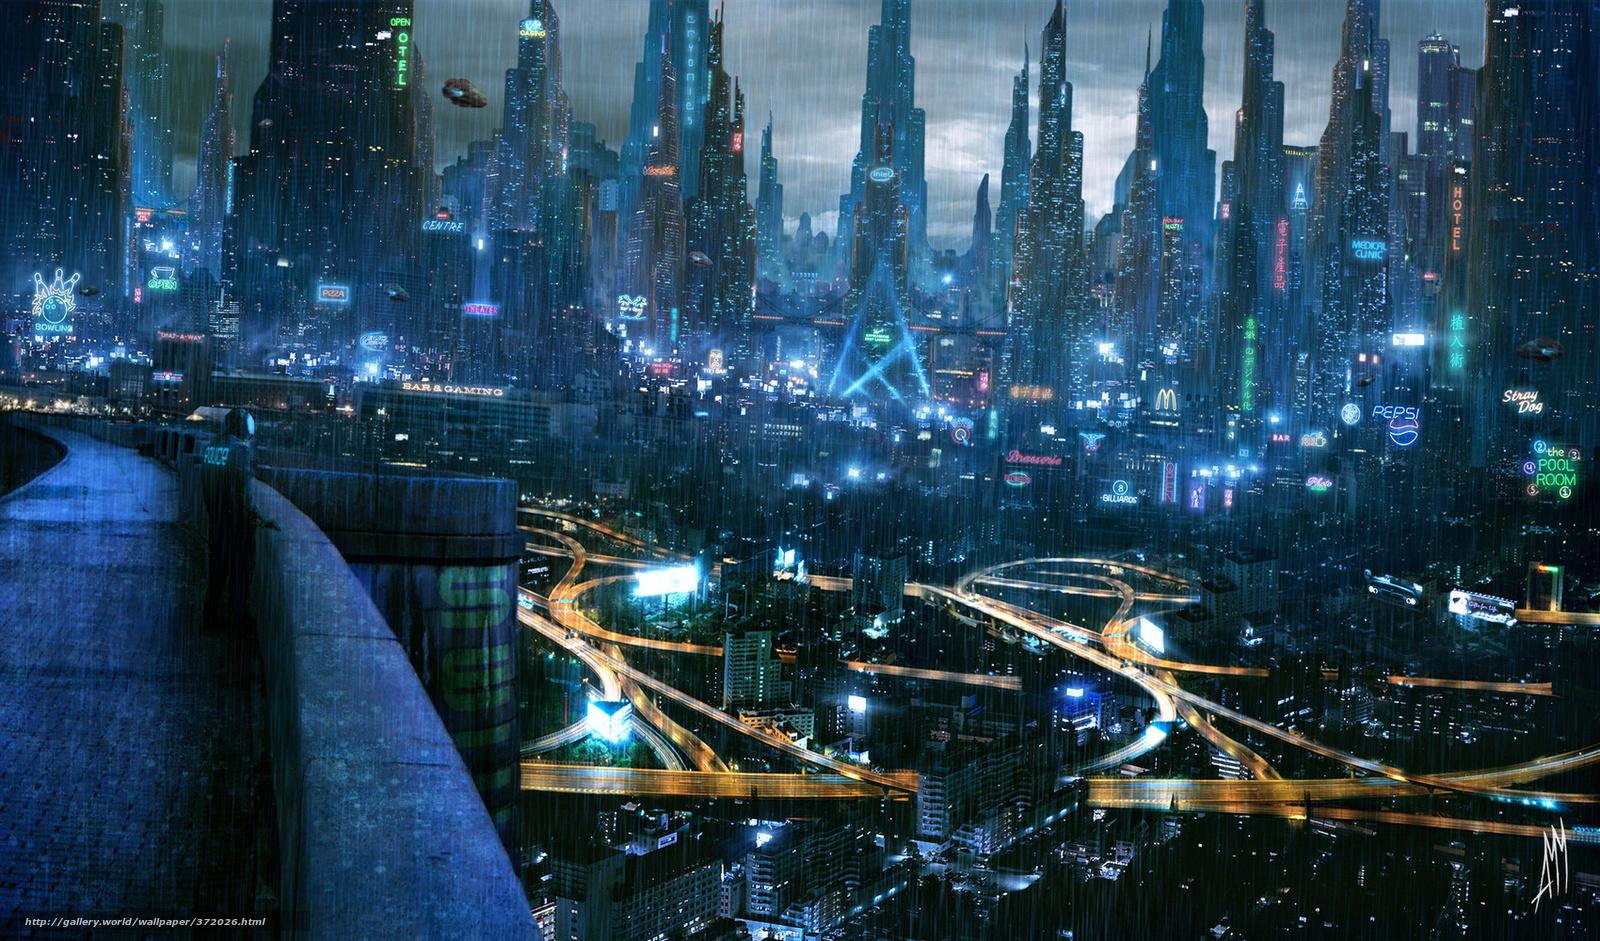 Download wallpaper Cyberpunk, future, rain, city free ...